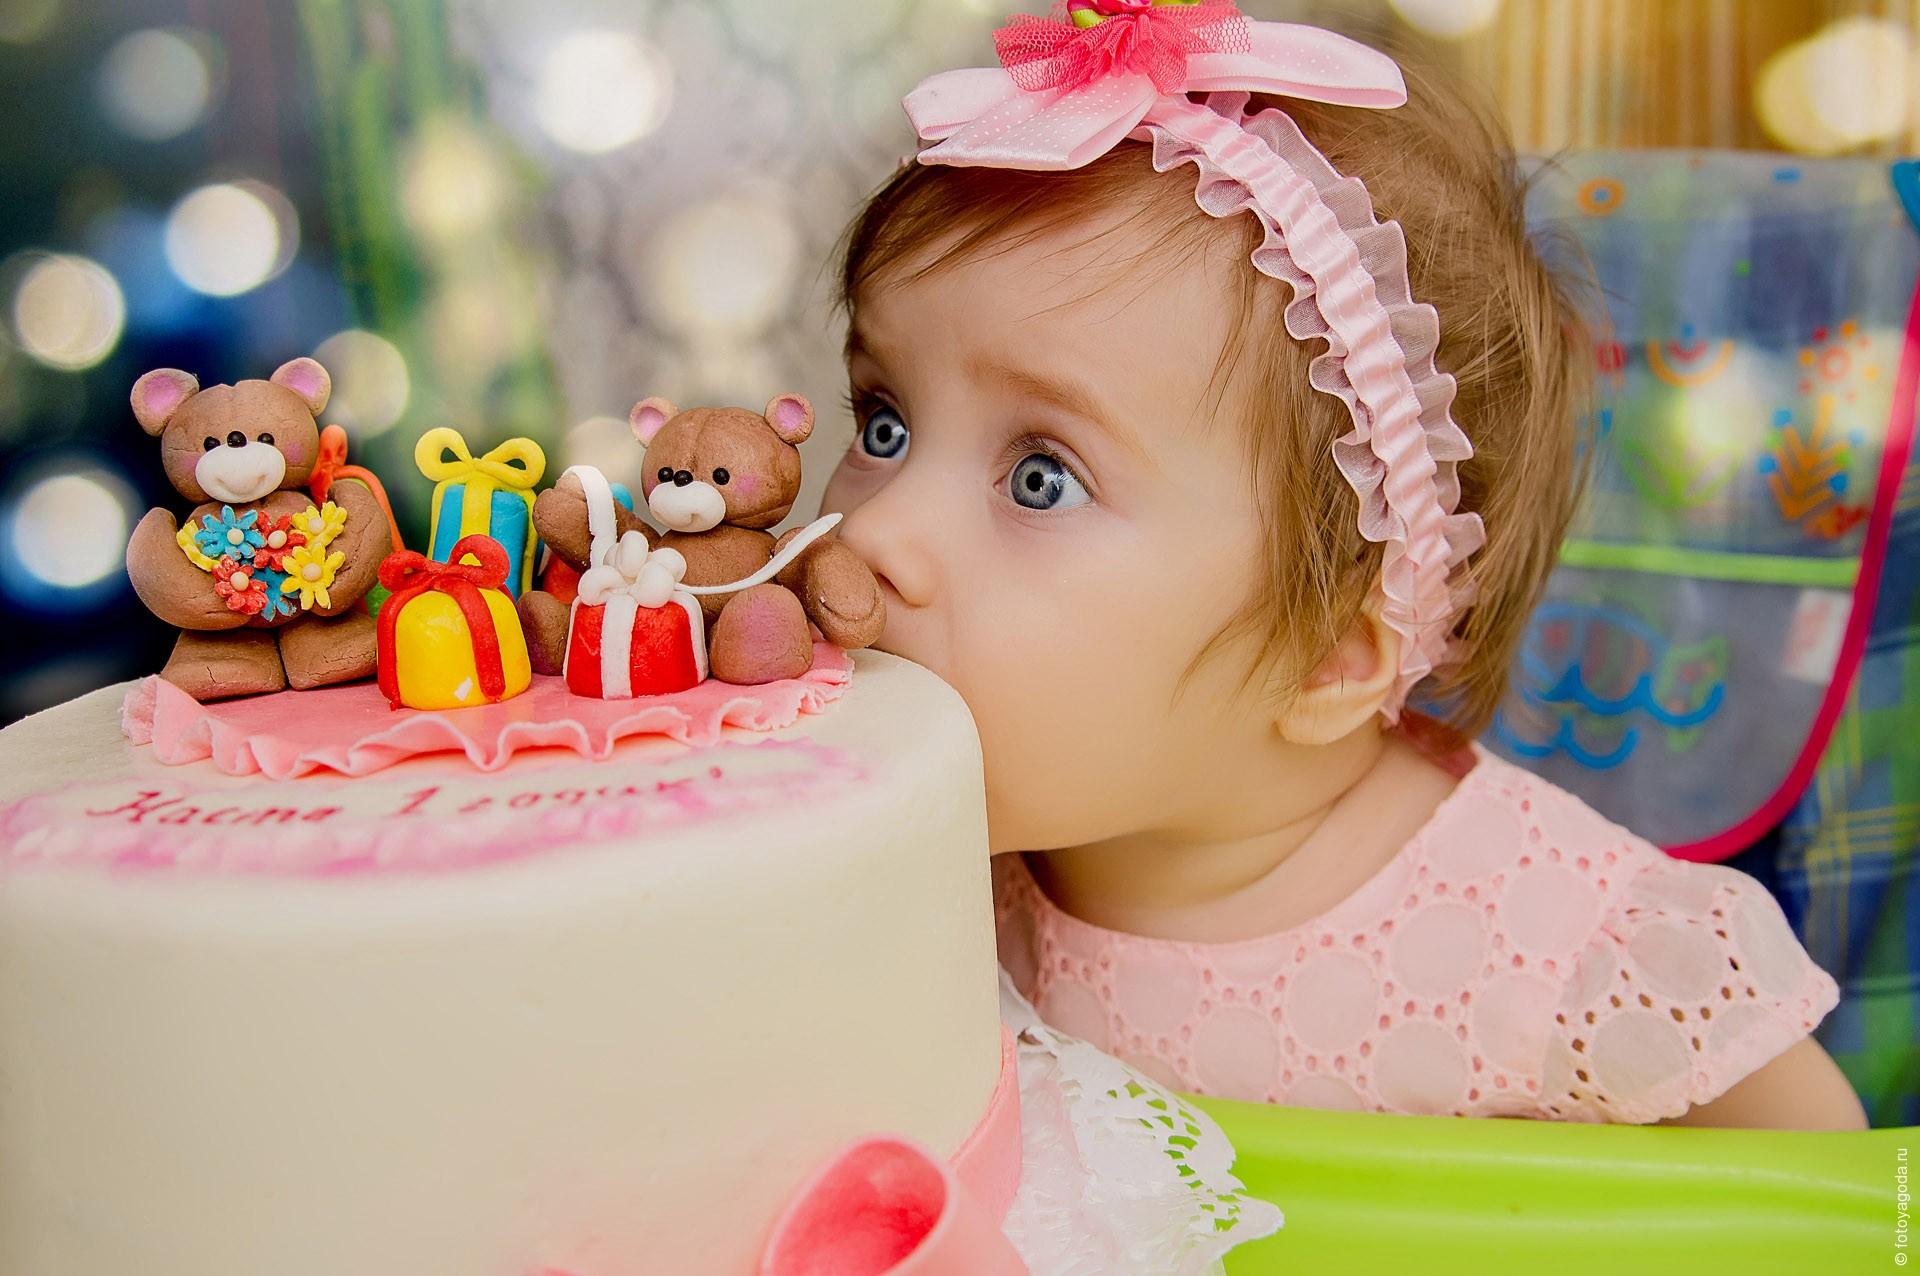 Малышка ест торт